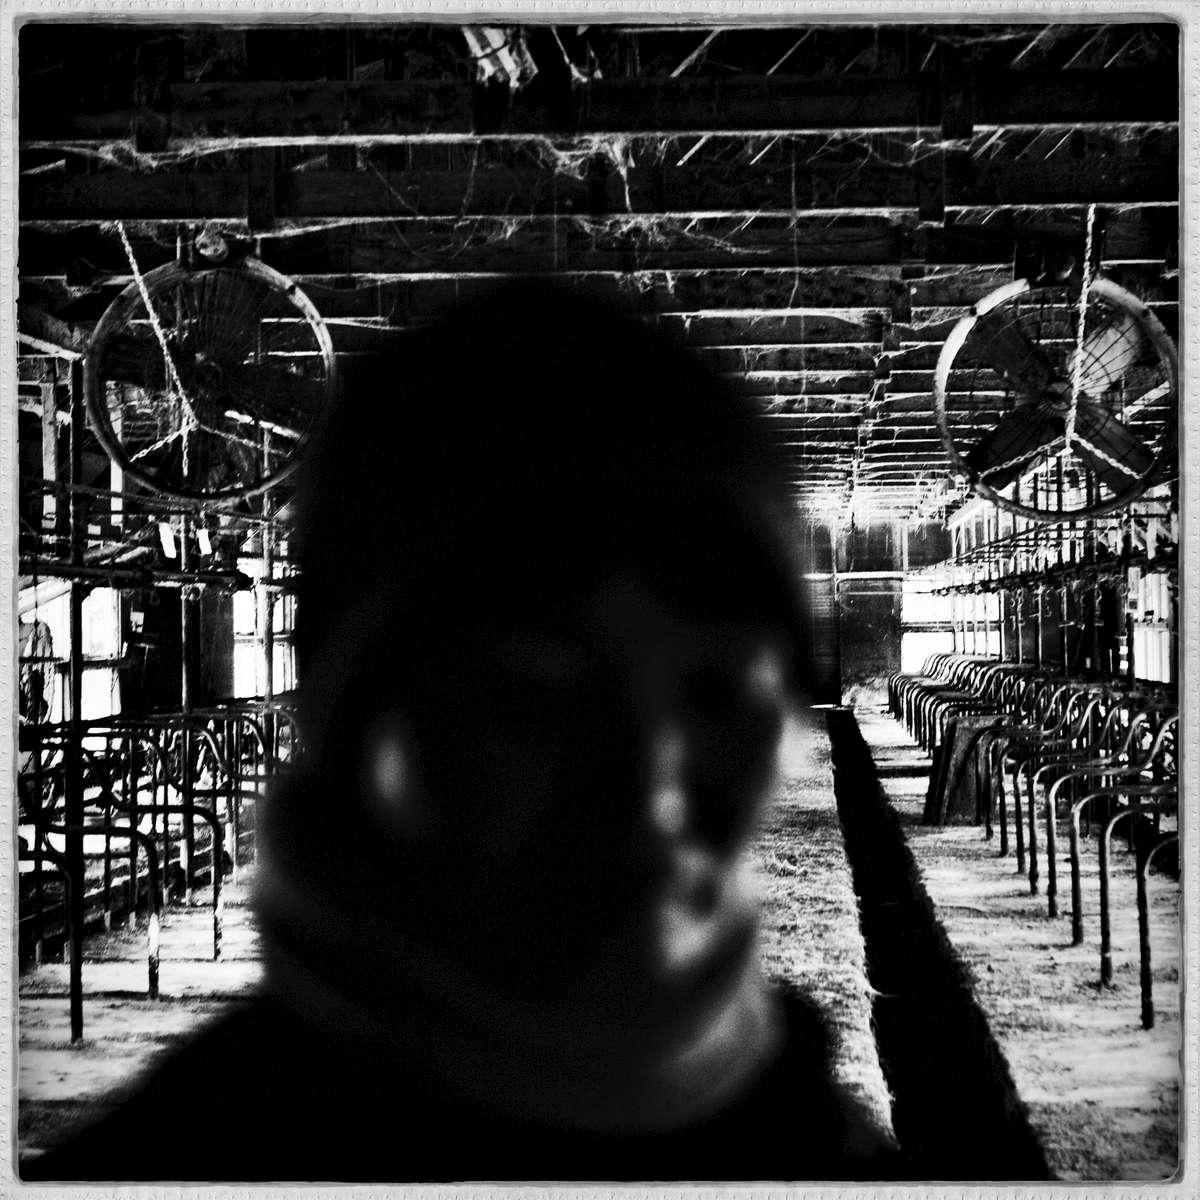 Keiko Sansei, 56, at her virtually abandoned dairy farm due to high radiation. Feb/ 2013, Tsushima, Namie.